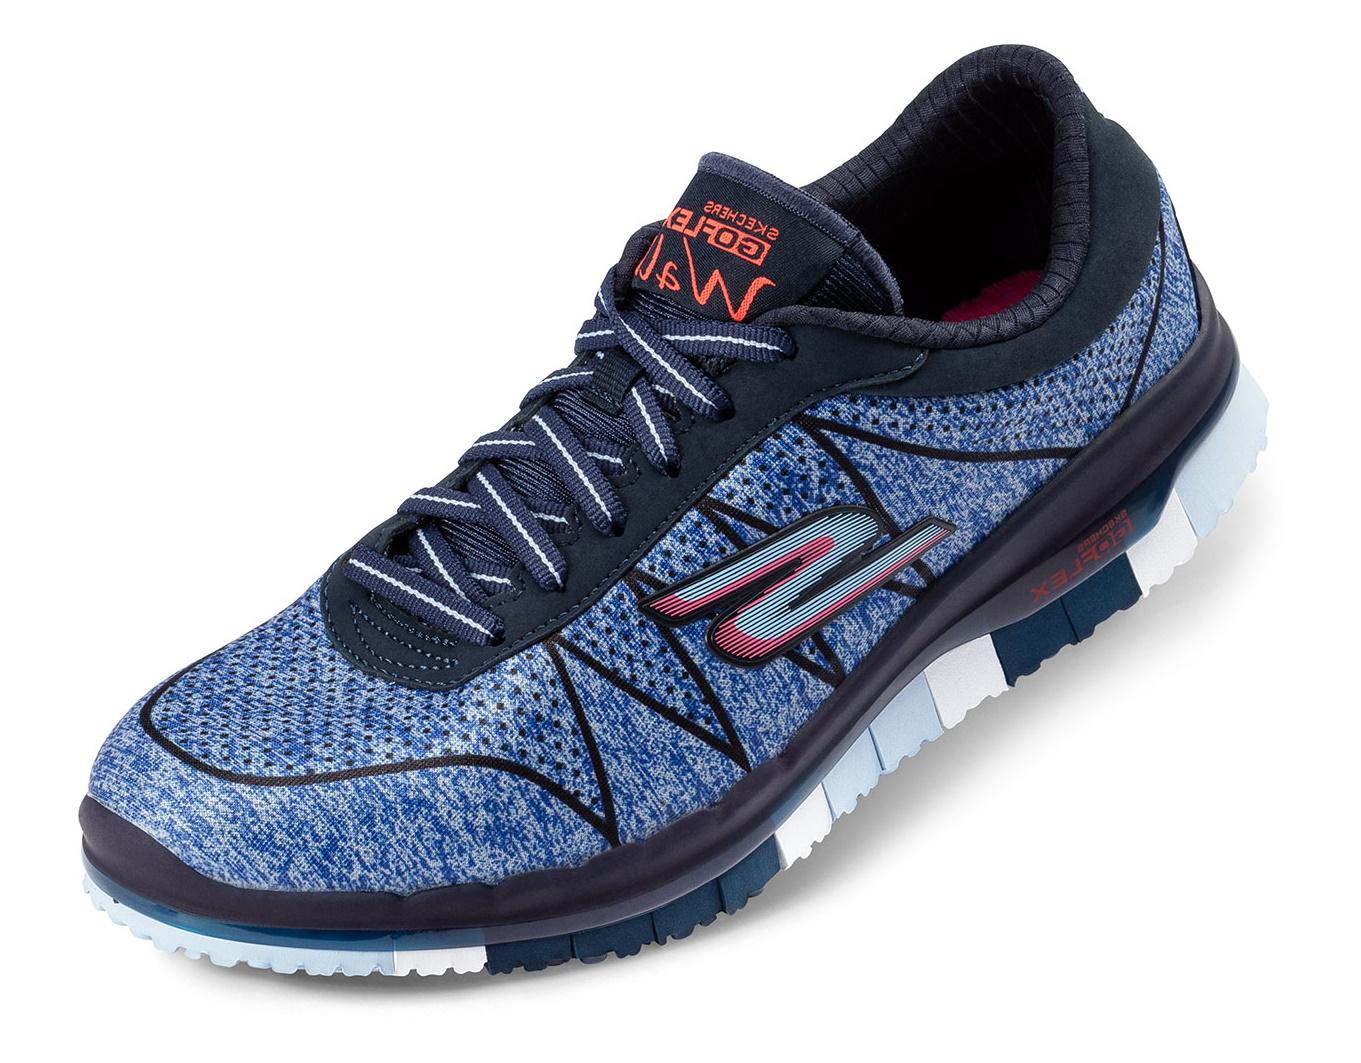 new york 62233 fcf17 Details zu Skechers Damen Go Flex Schuhe Sneaker Freizeitschuhe Laufschuhe  Turnschuhe blau